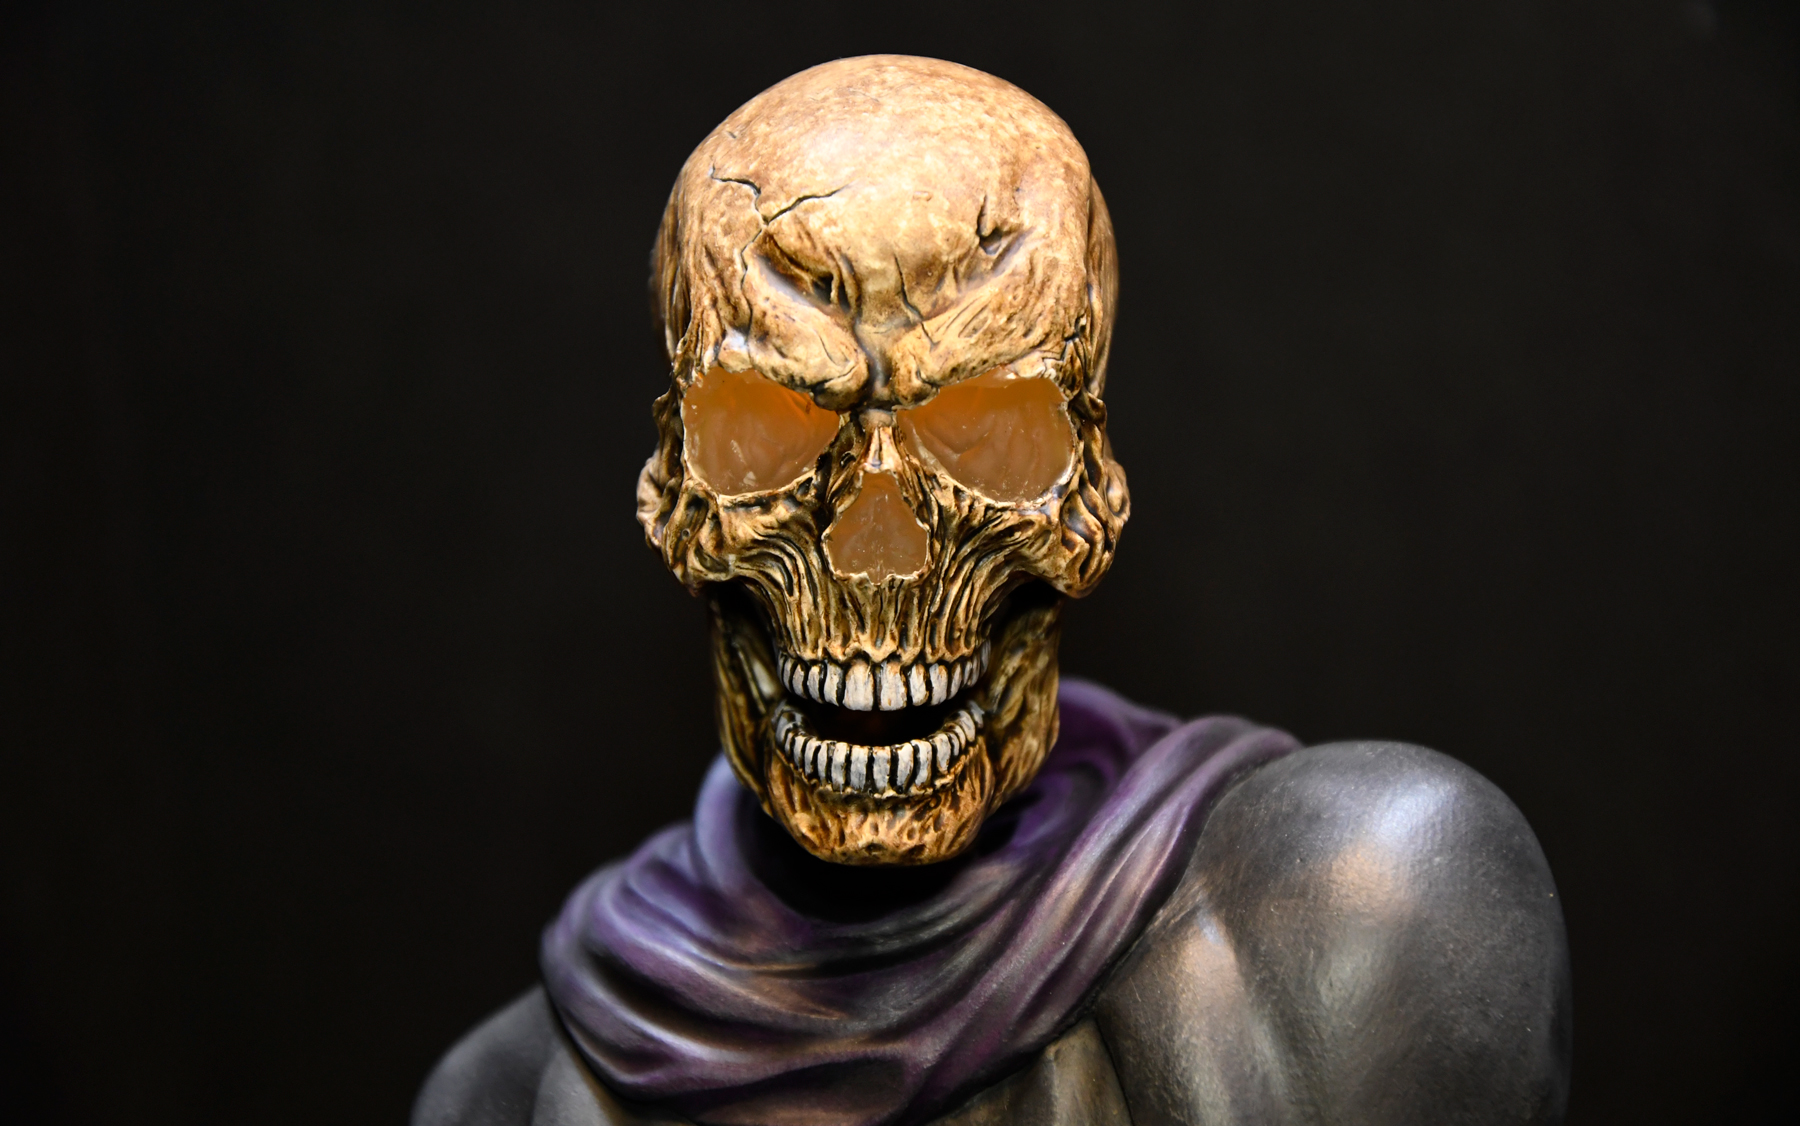 Demons of the Apocalypse #1: Death